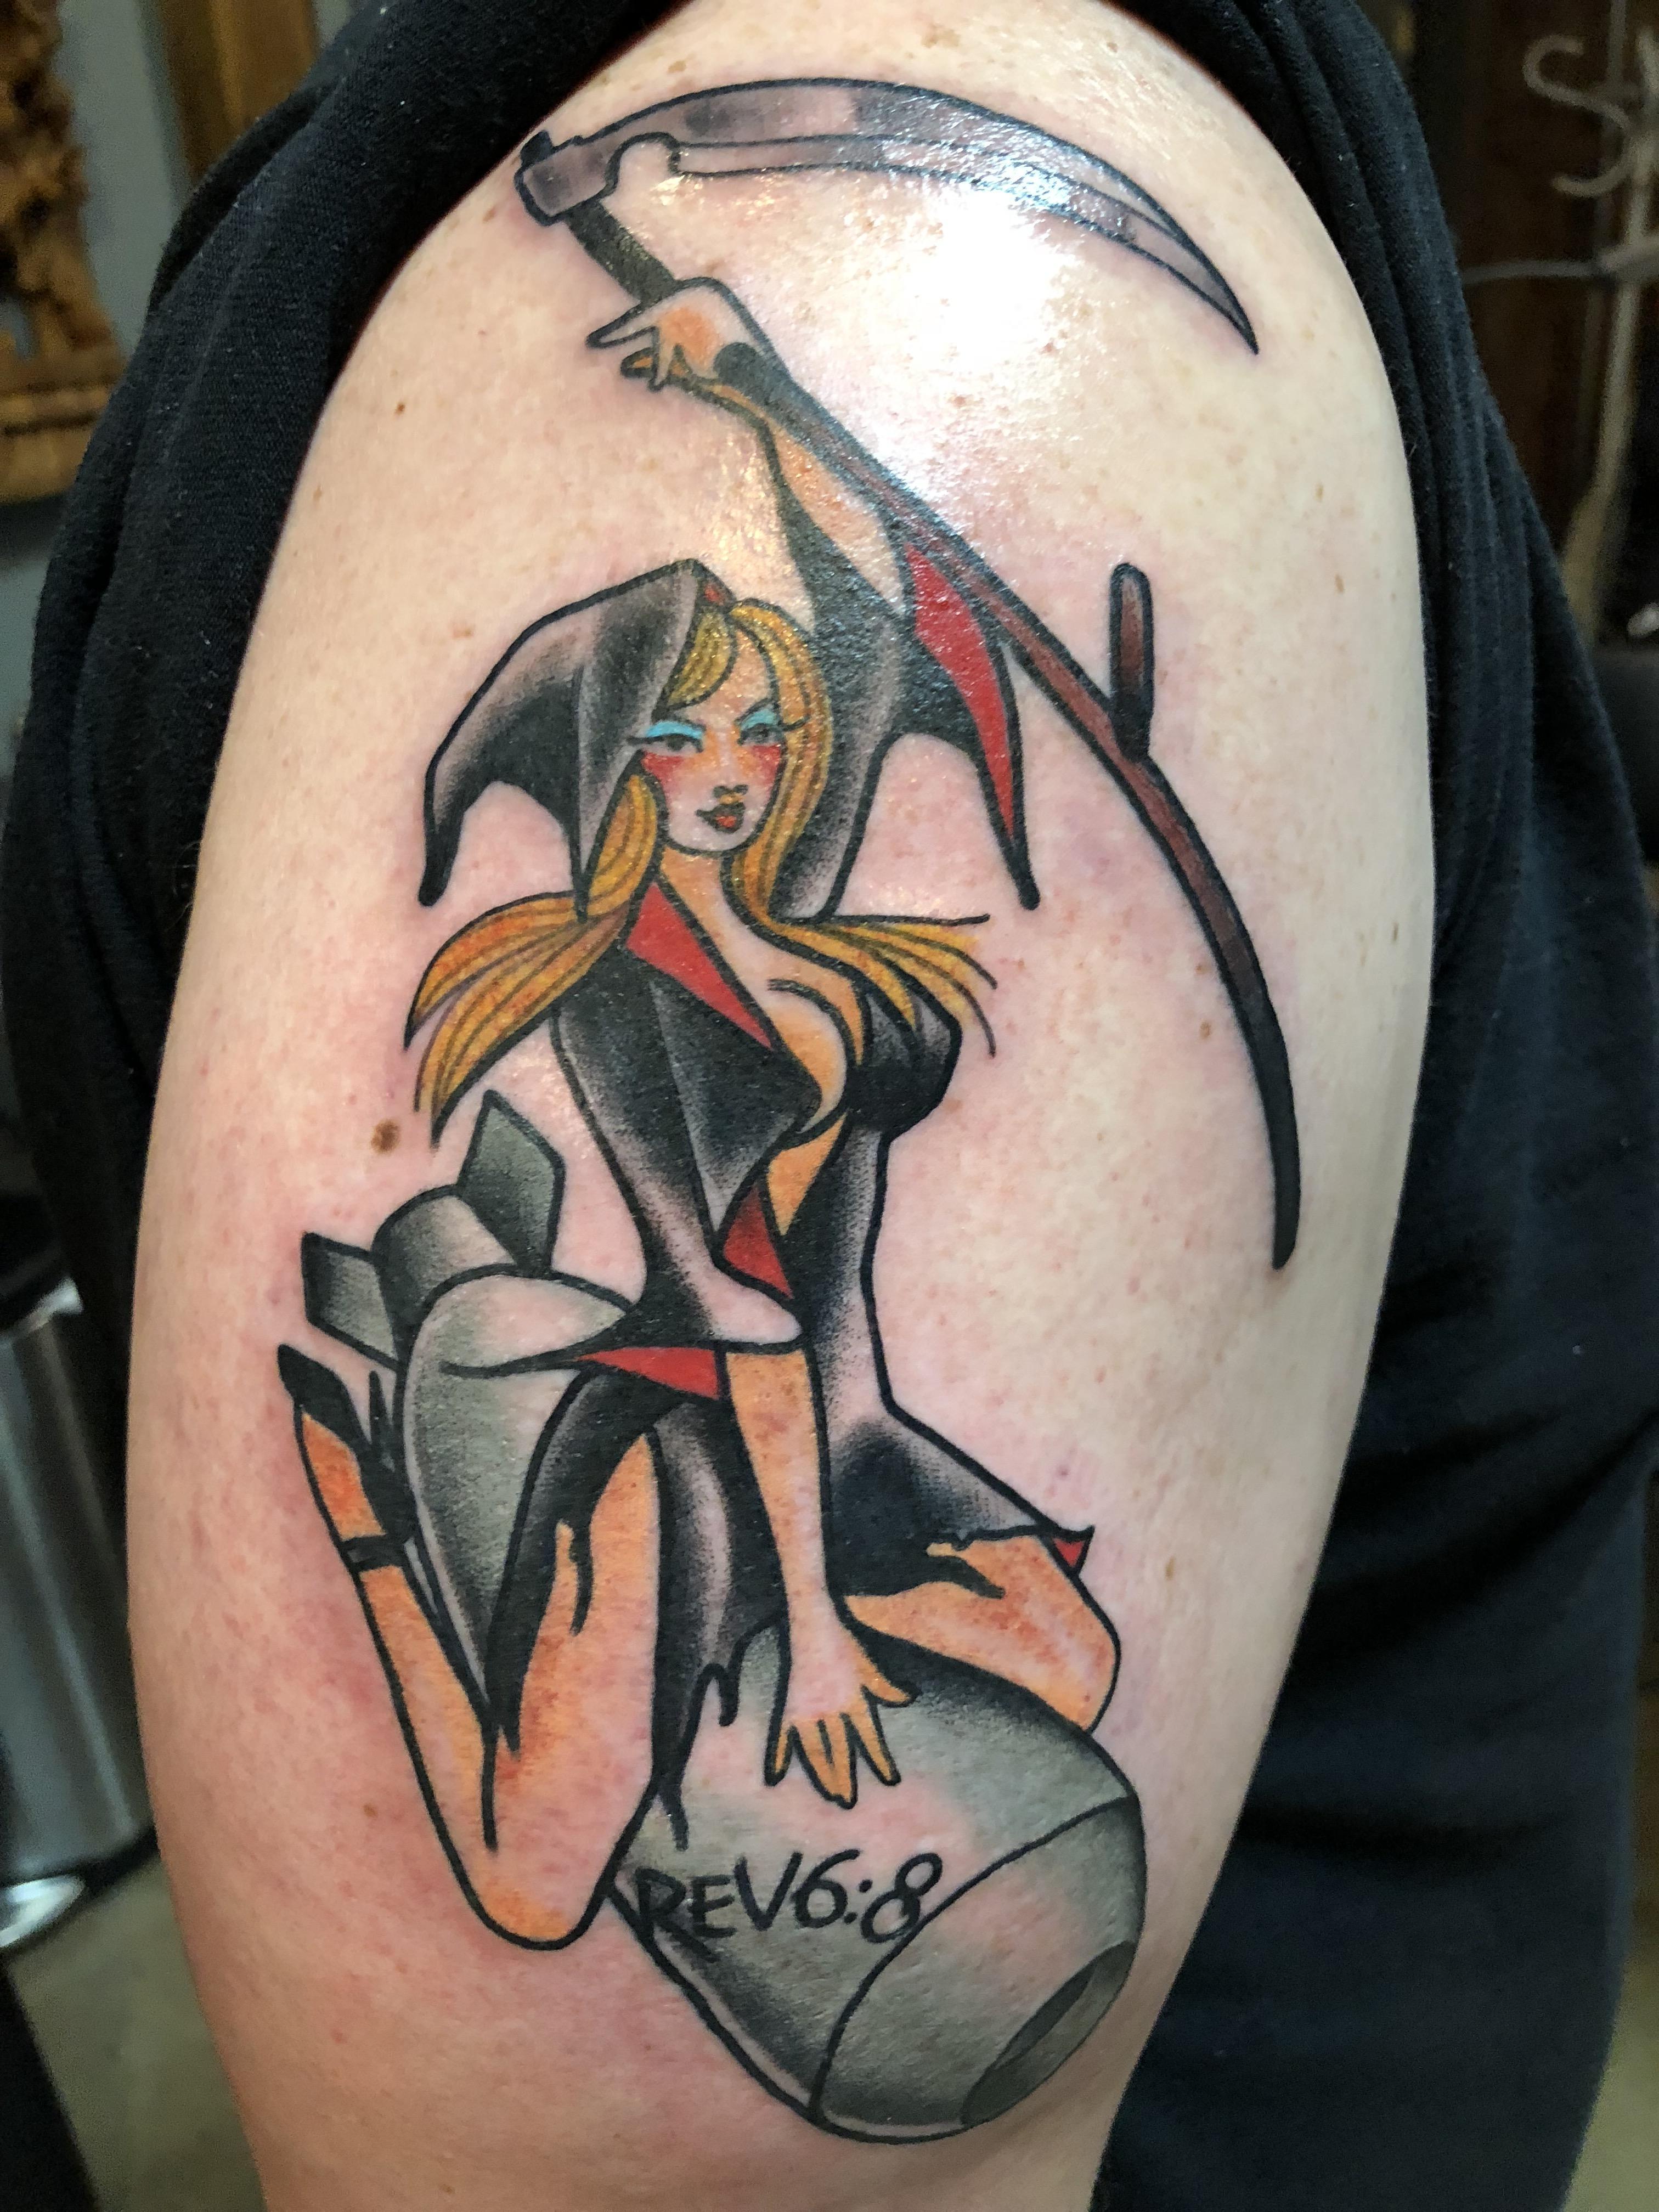 Pale Horse Tattoos : horse, tattoos, Revelations, Behold, Horse..., Leviticus, Minneapolis., Tattoos